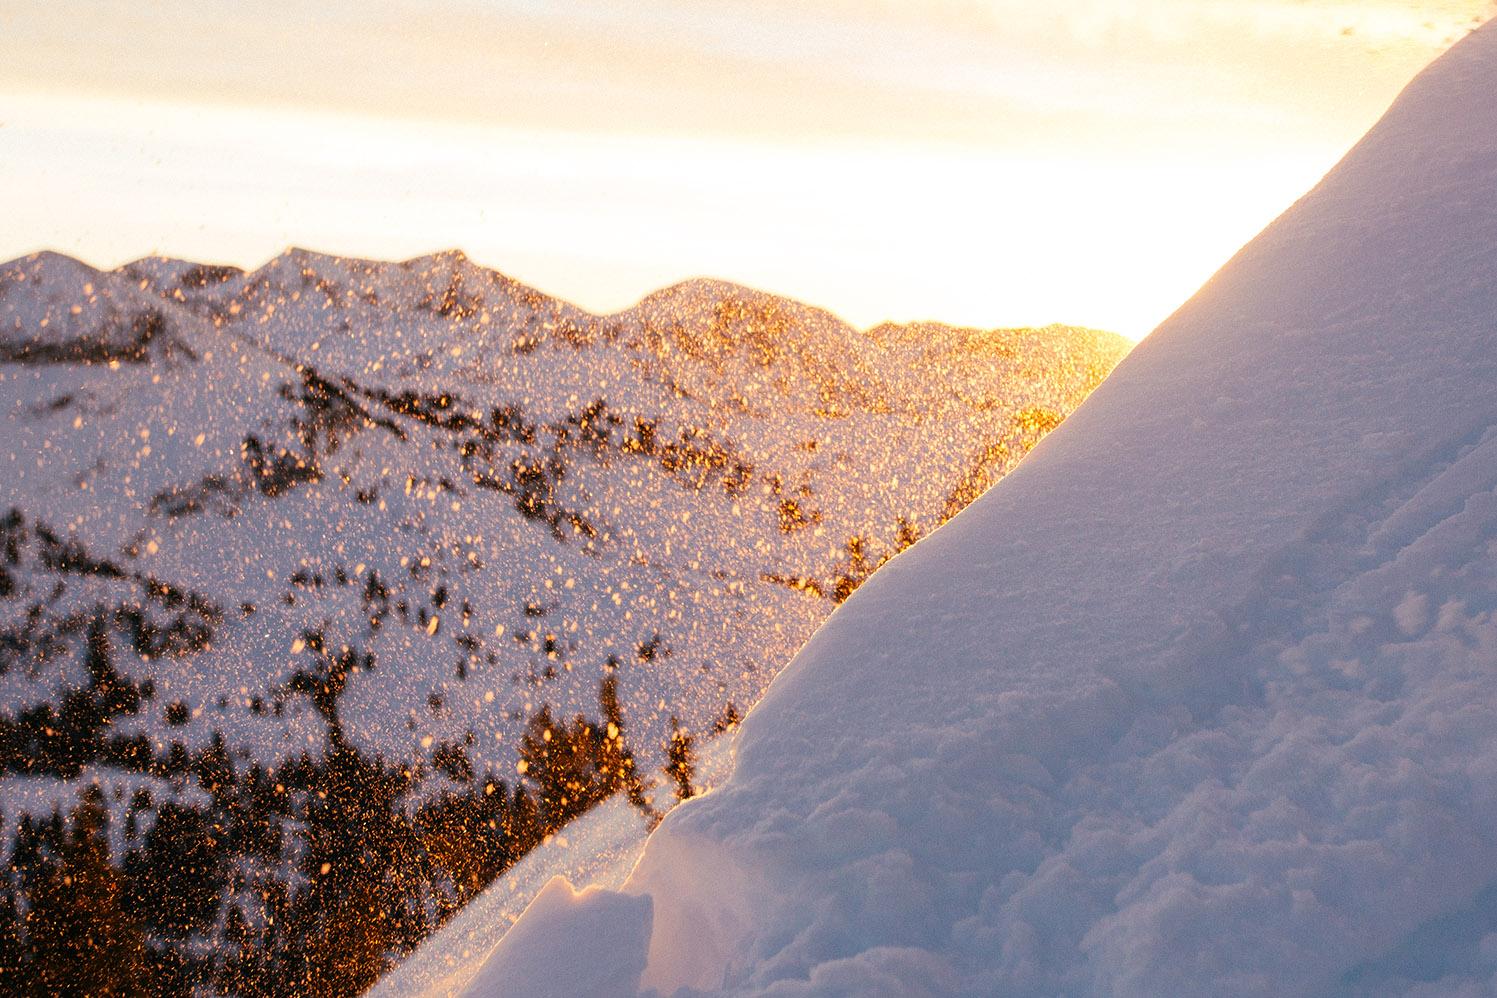 snow-sun-sunset-orange-purple-blue-winter.jpg